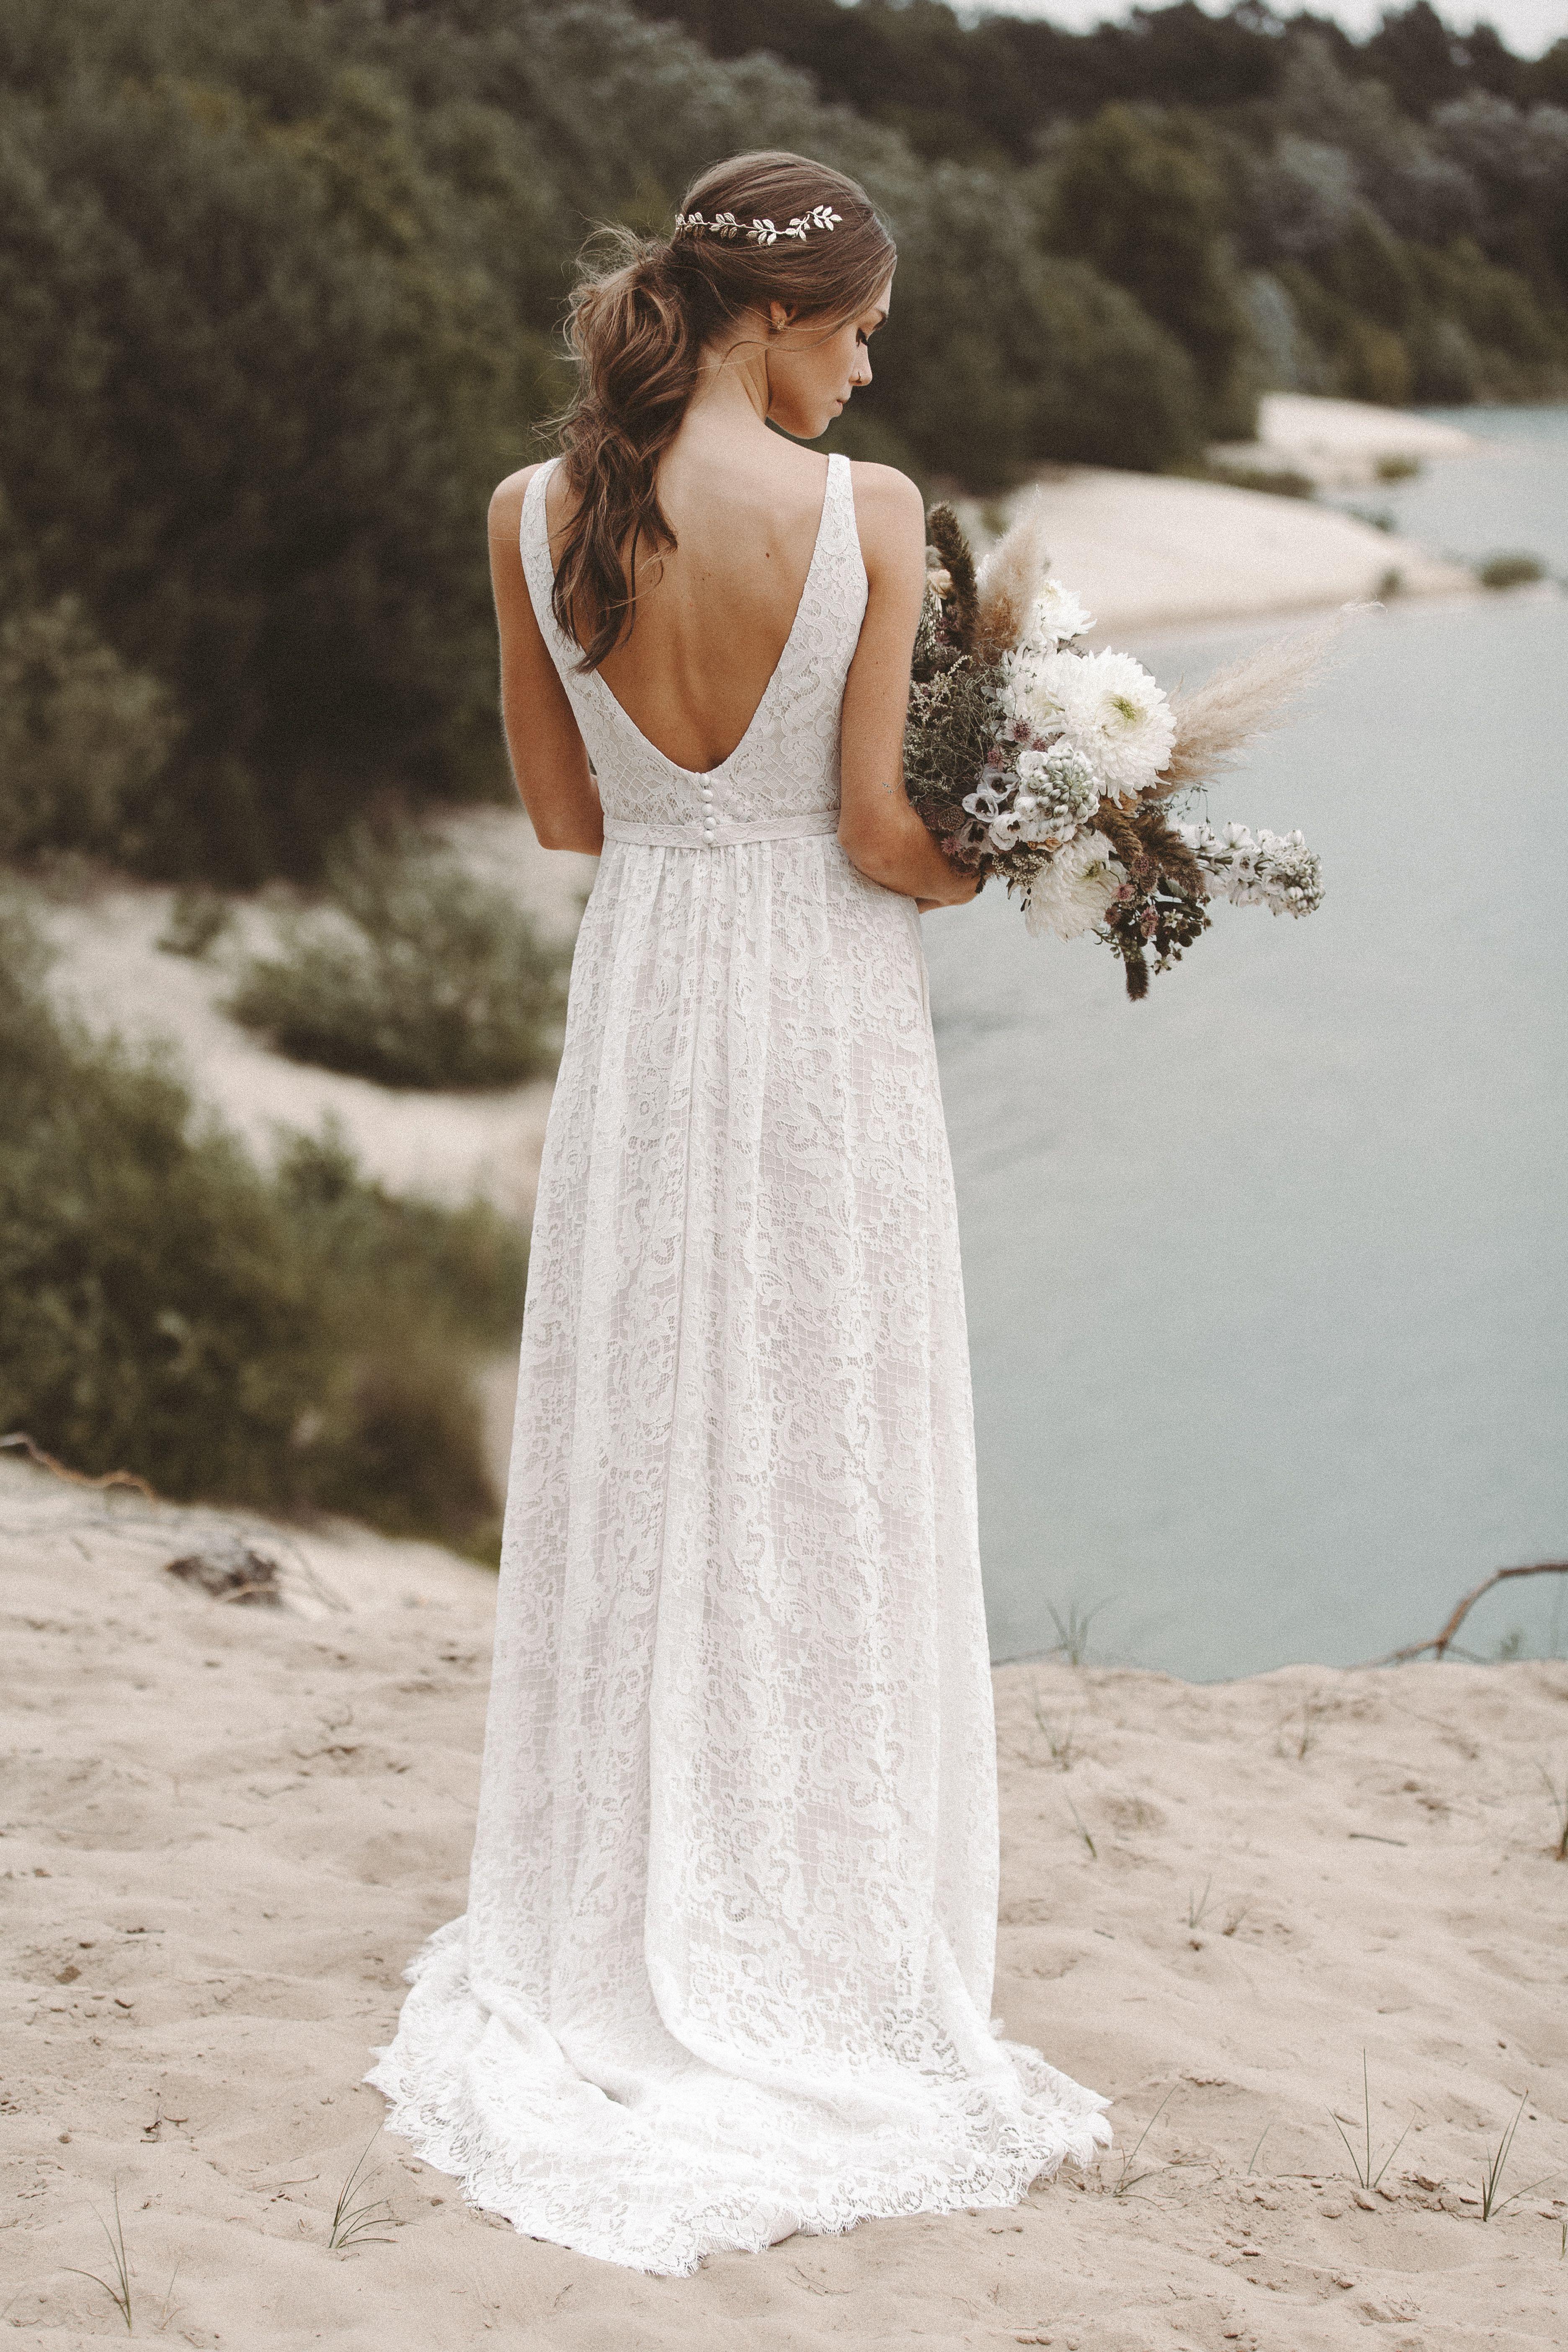 Brautkleid spitze rückenausschnitt hochzeitskleid boho bohemian